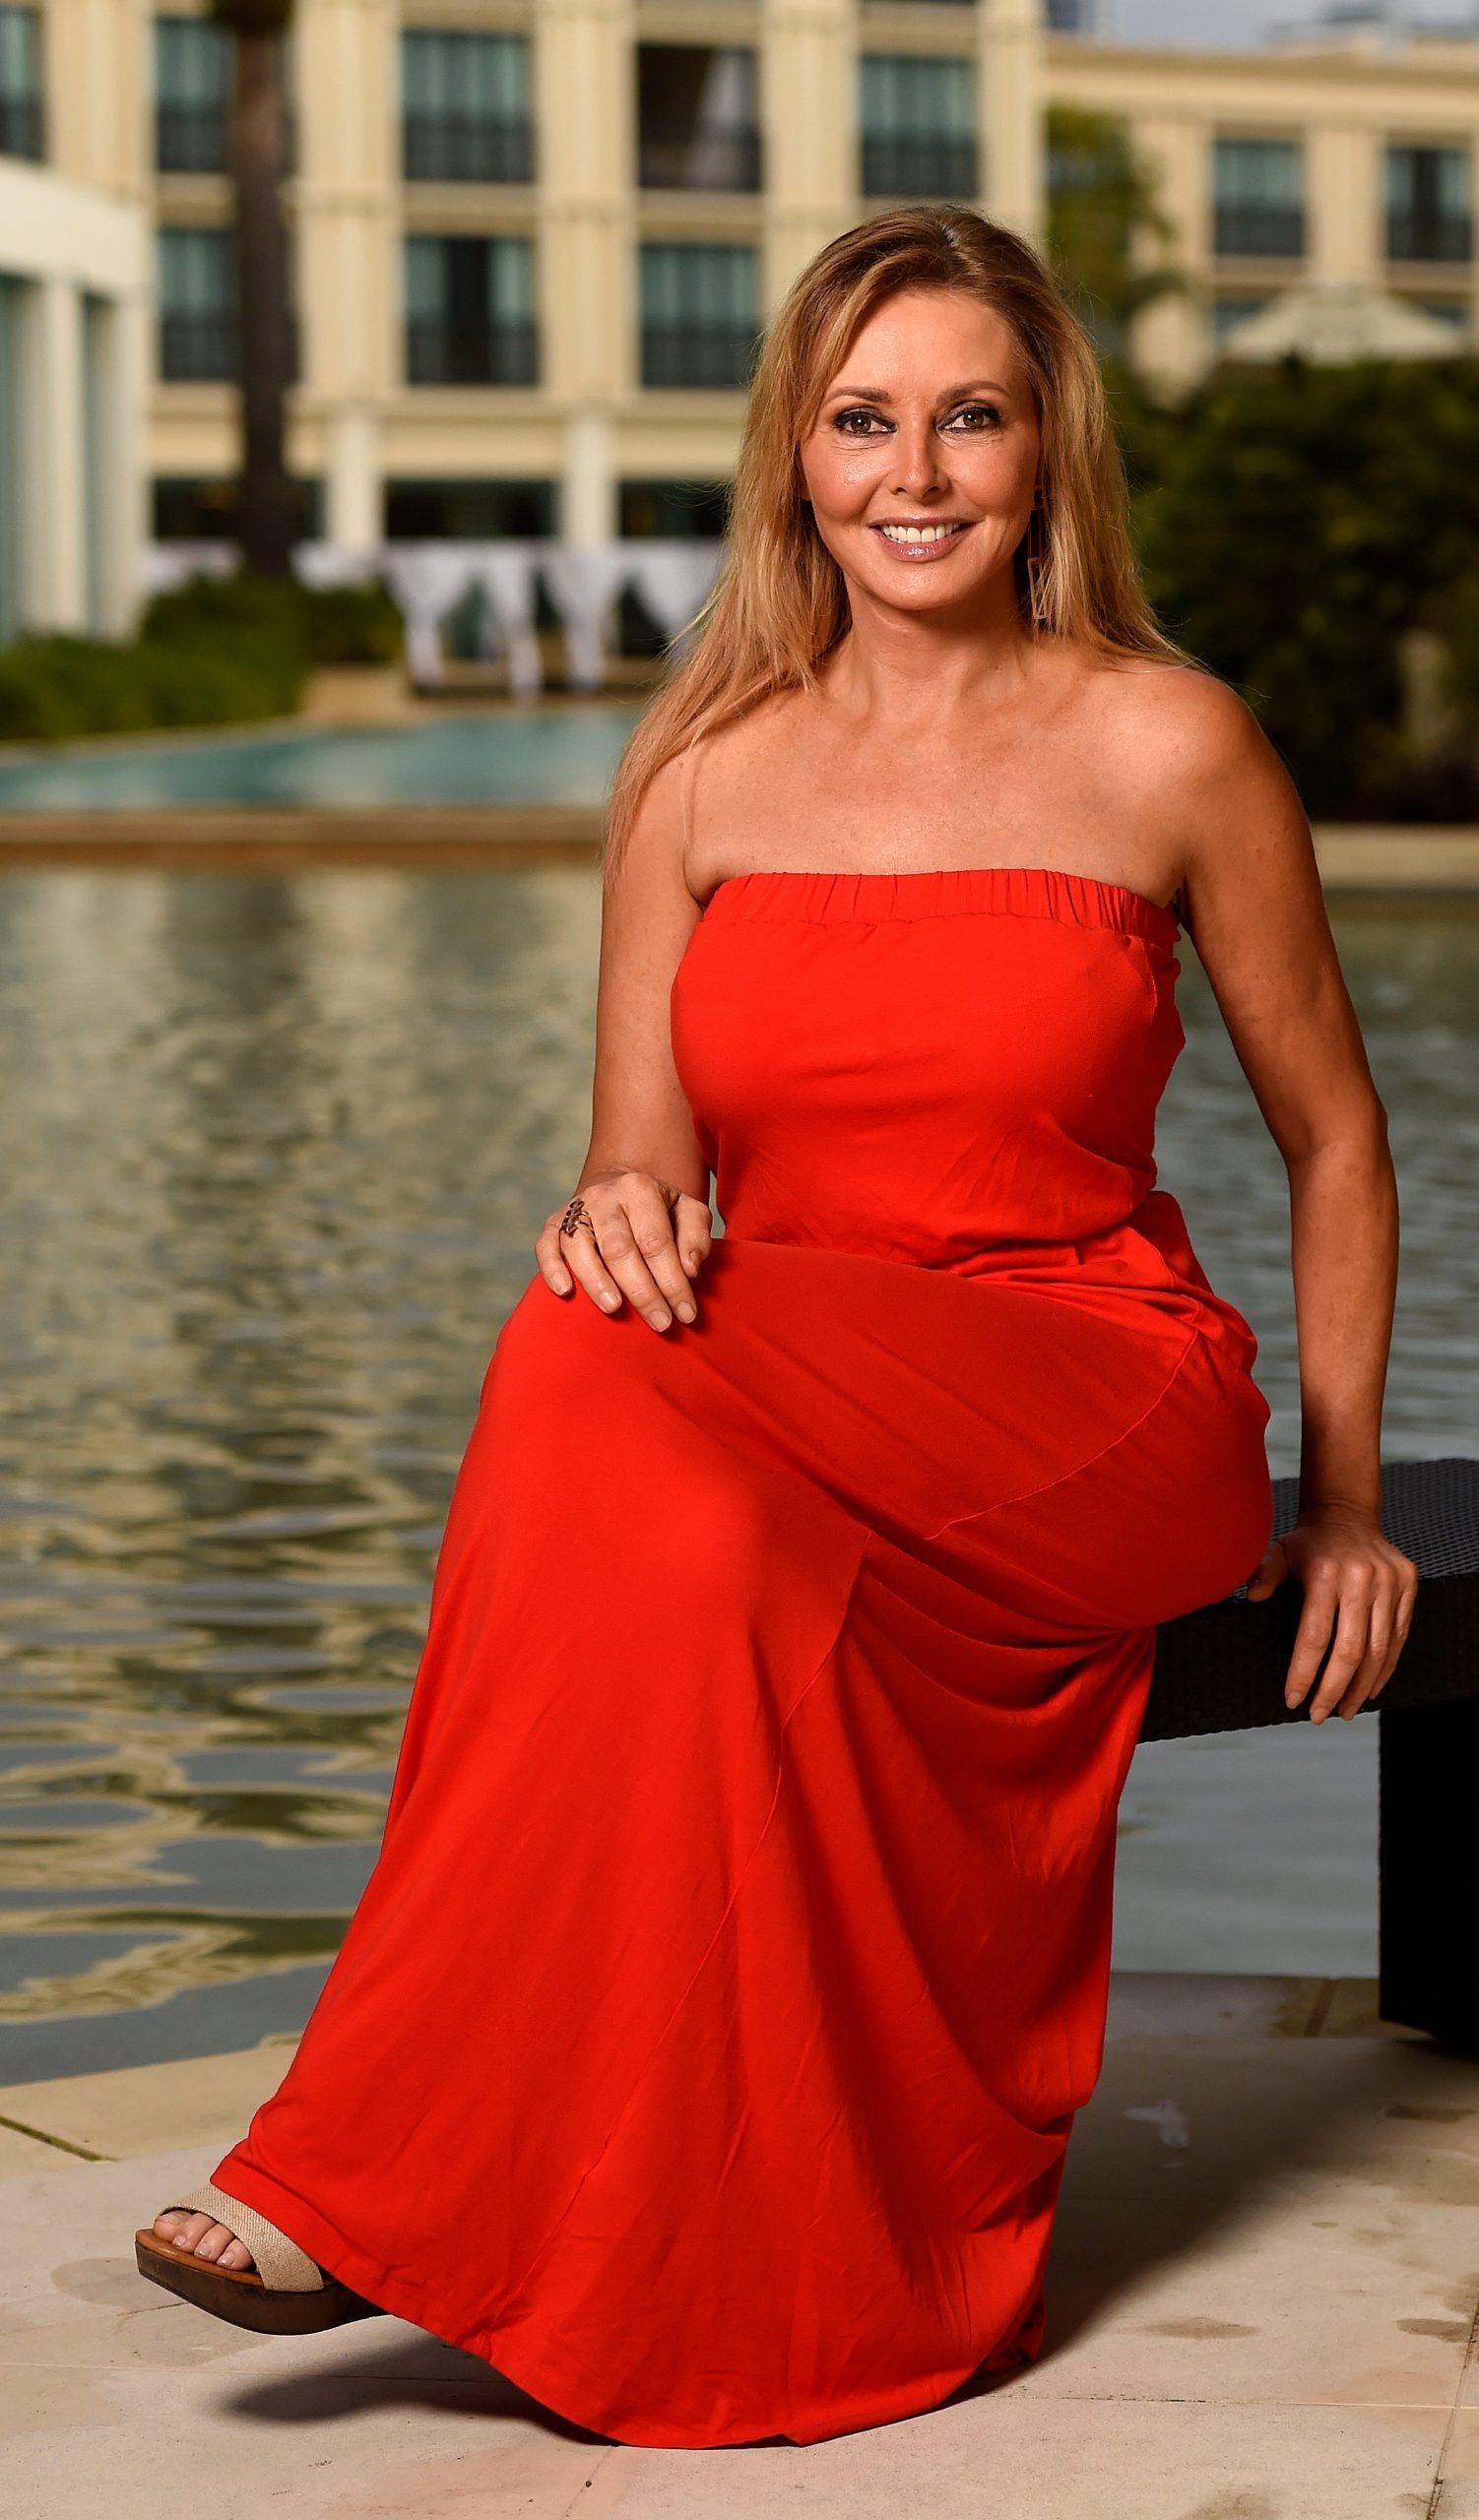 Carol Vorderman sexy red dress pics